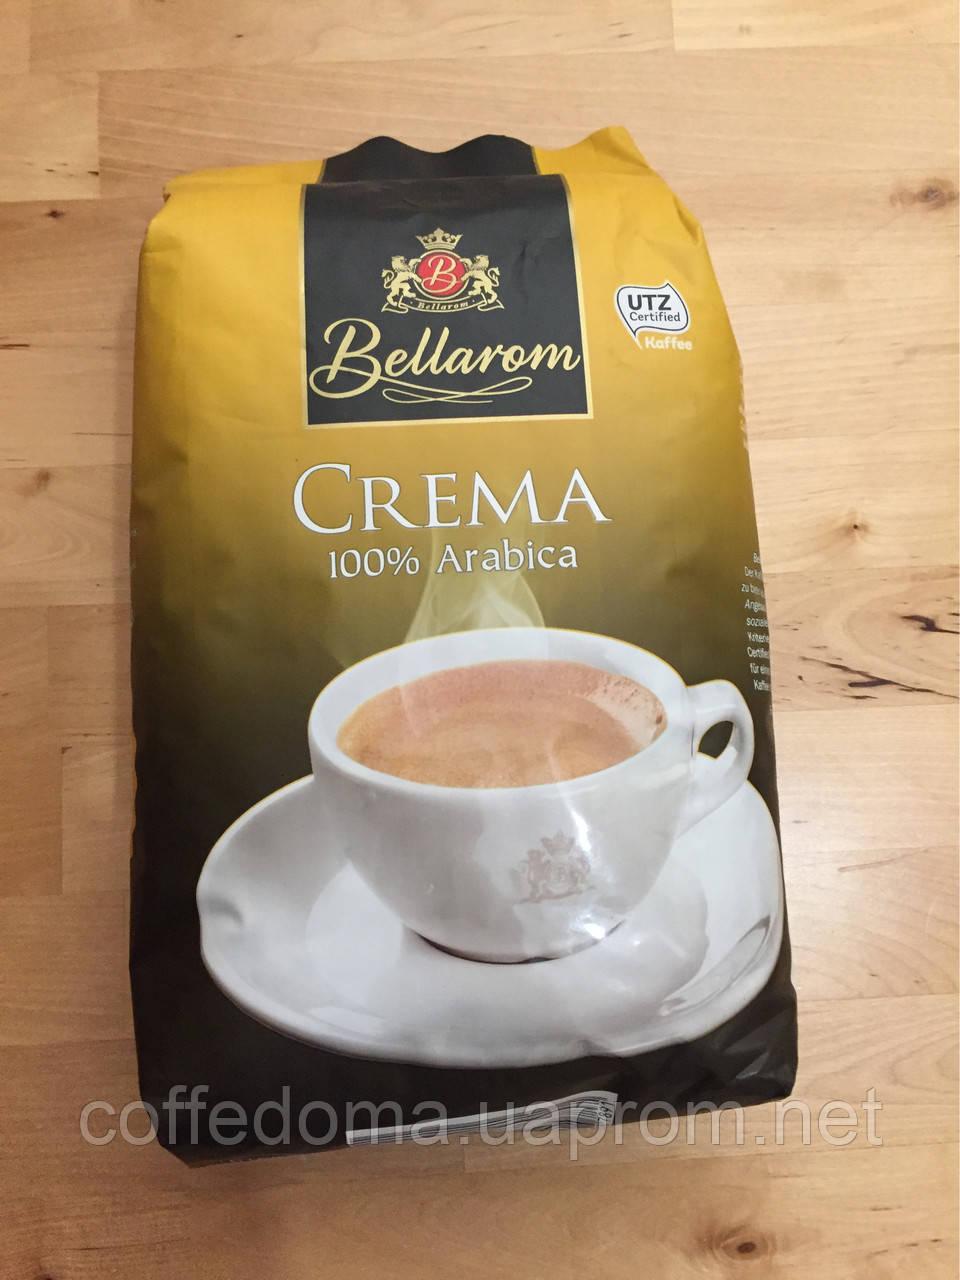 Bellarom Crema Arabica кофе в зернах, фото 1